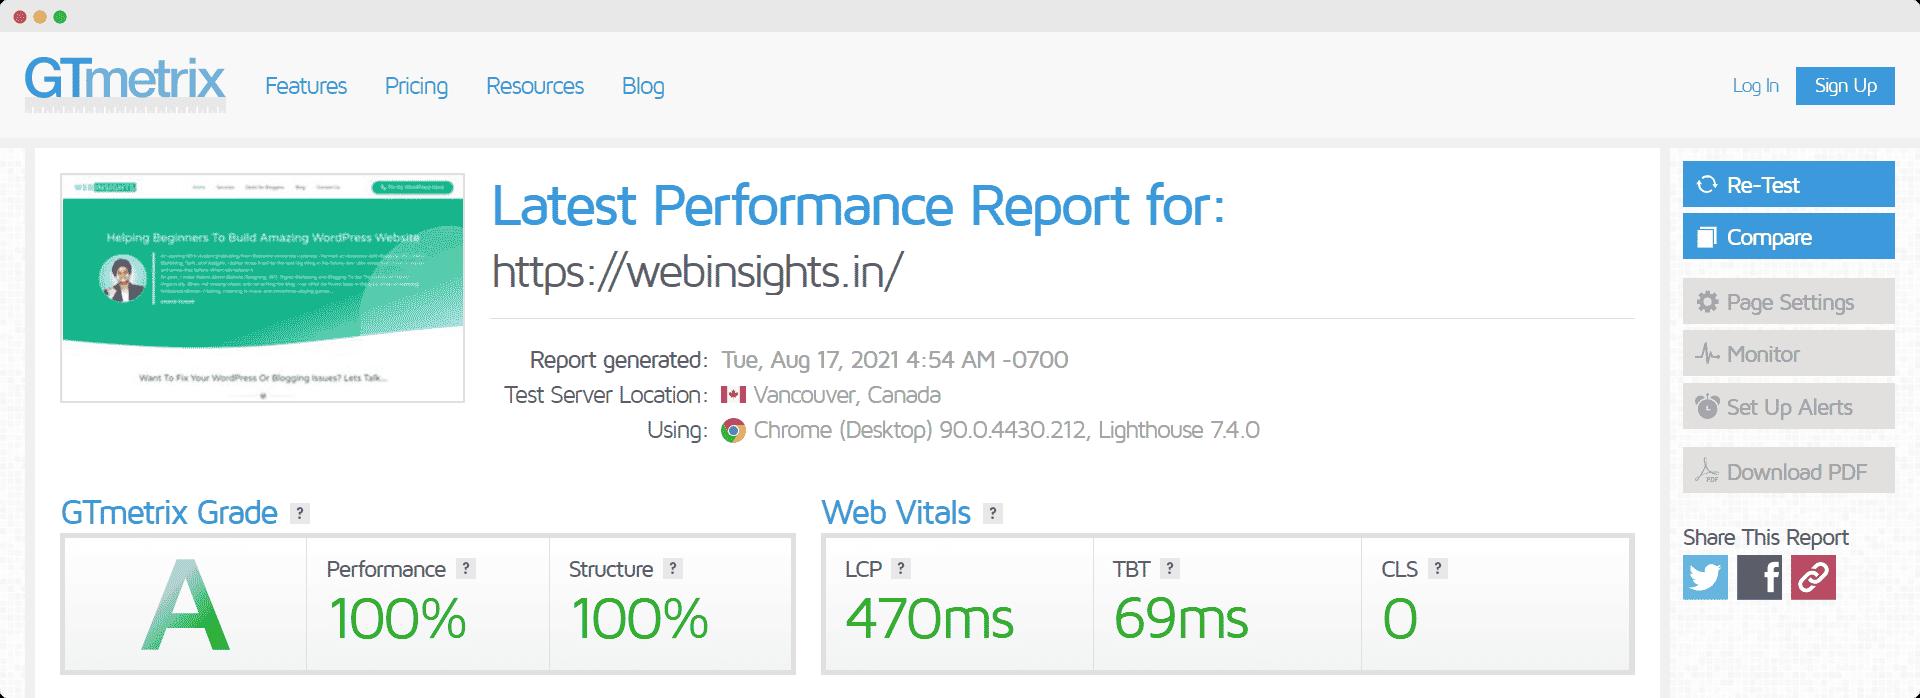 Web Insights Report